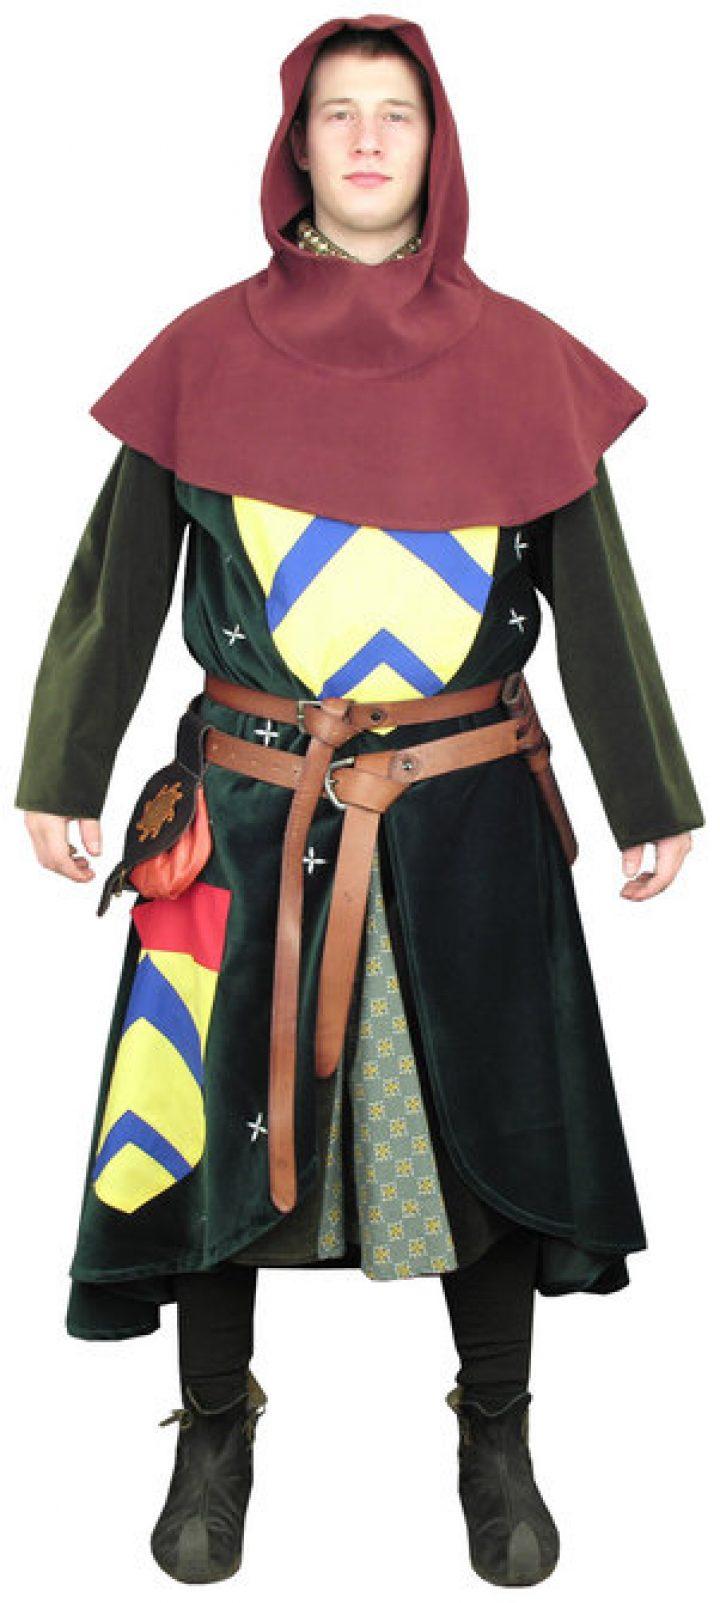 Mittelalter Kostuum hvmna-1037